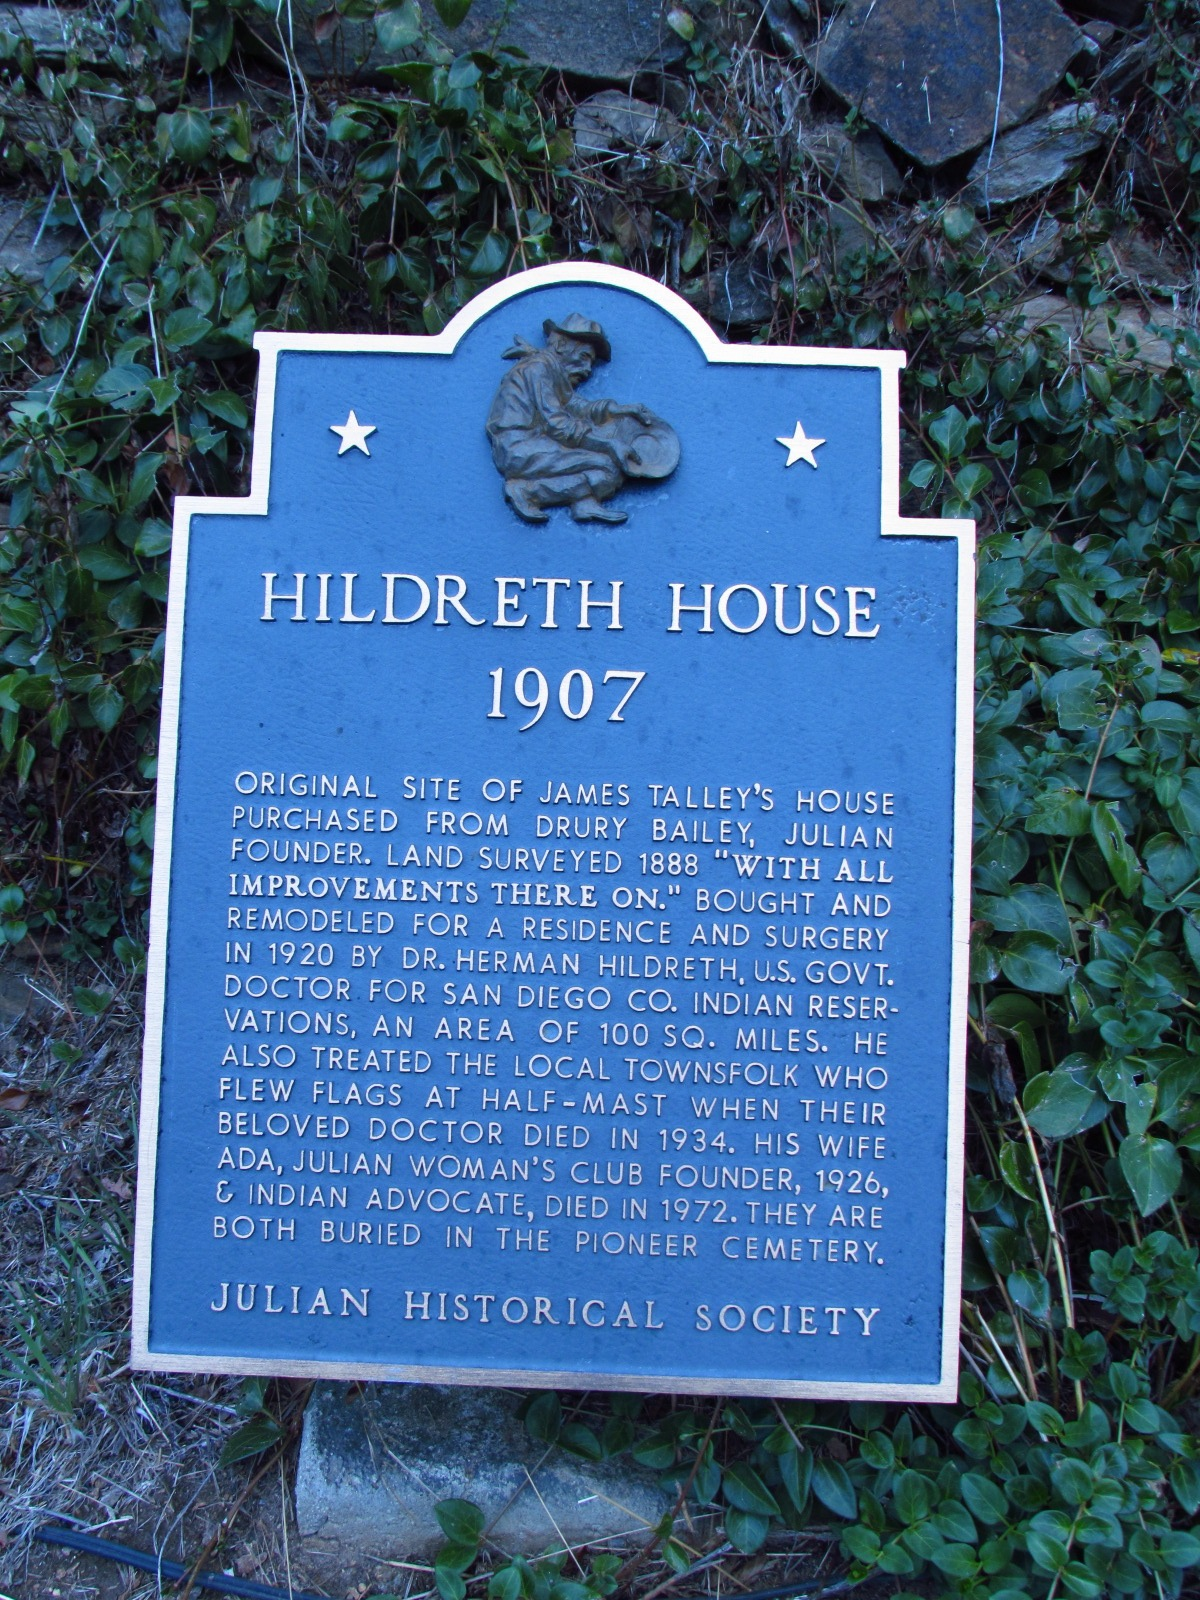 Julian Historical Society Hildreth House Sign